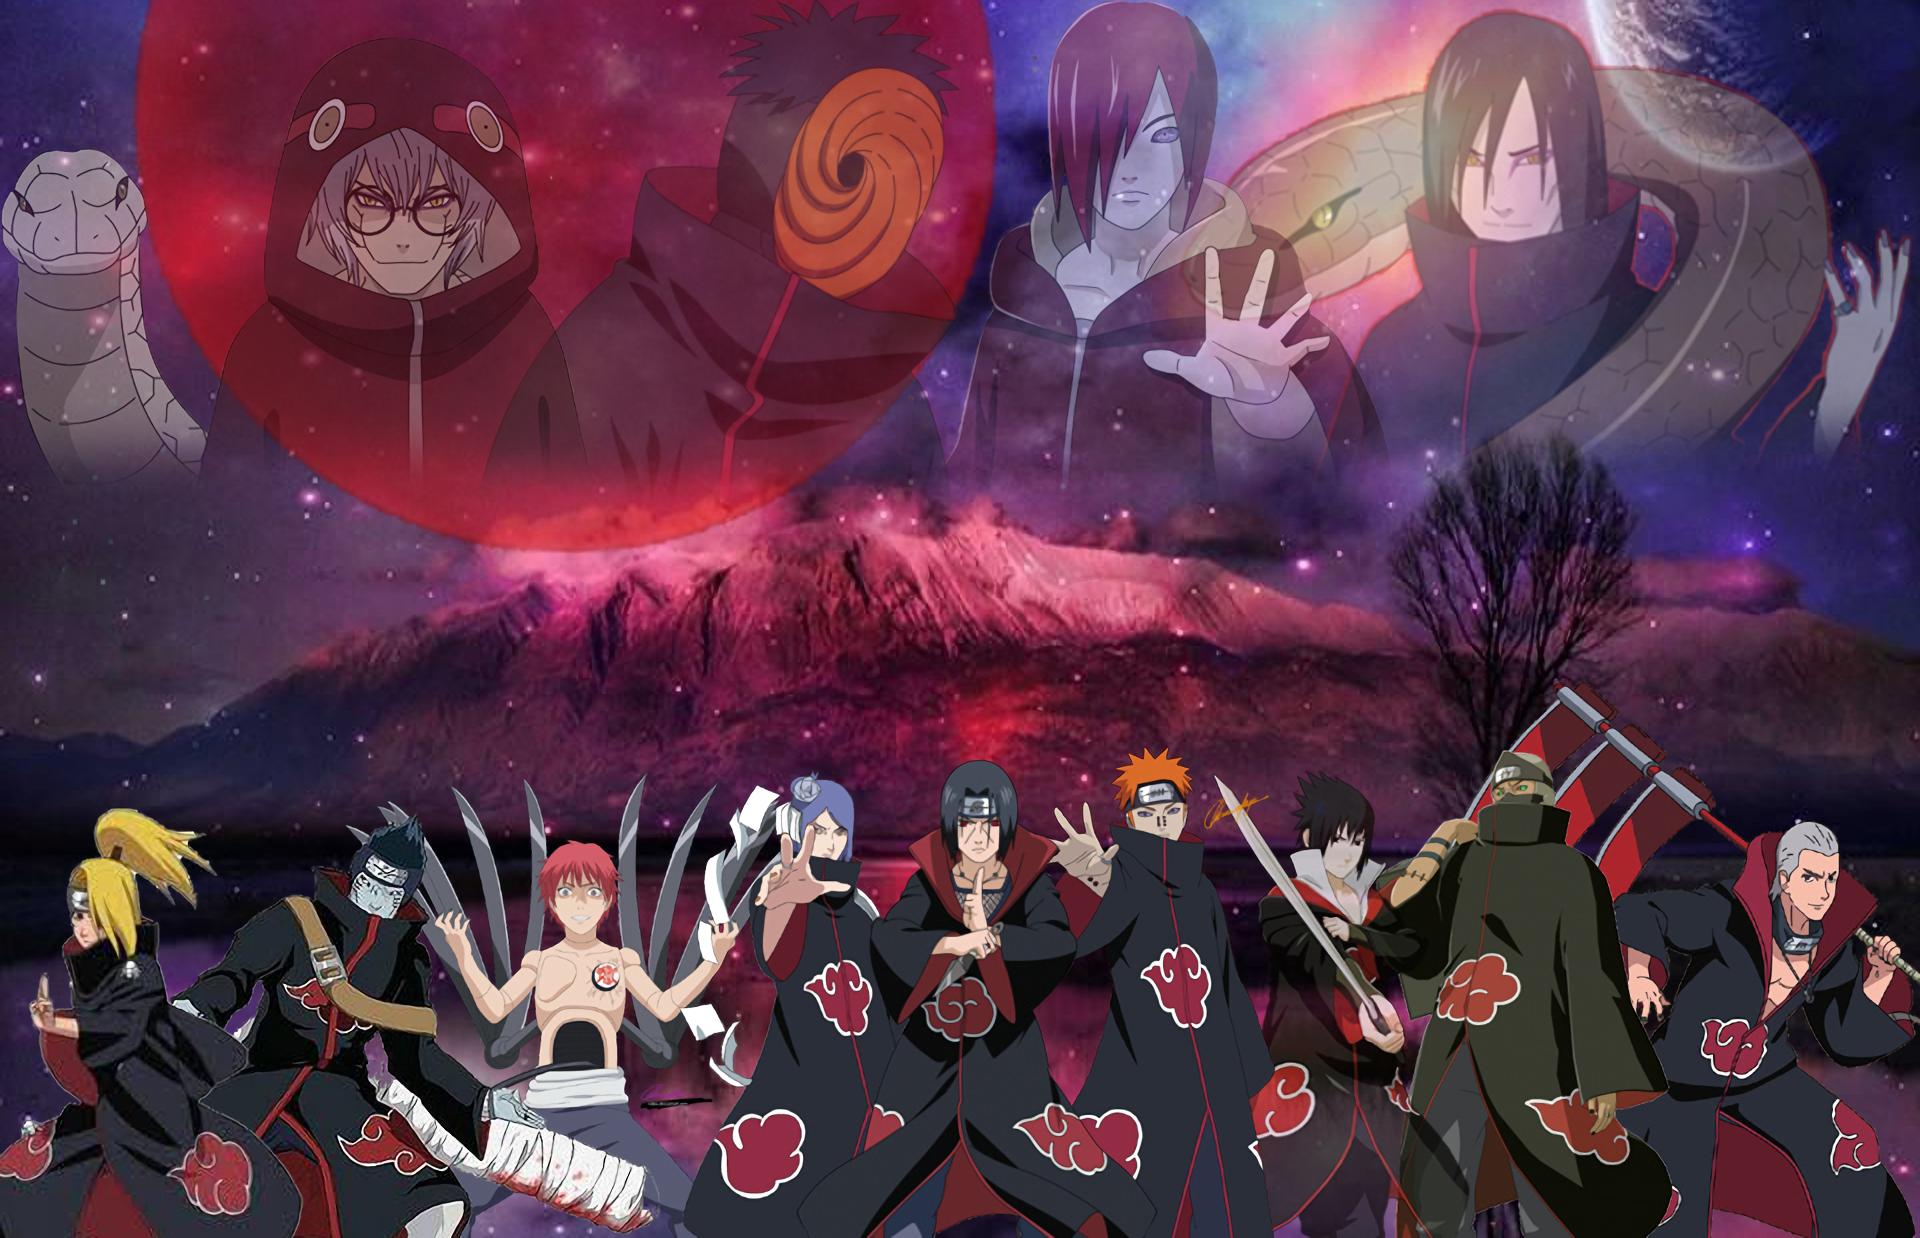 Purple Naruto Pain Wallpaper Drgokhanakturk.com